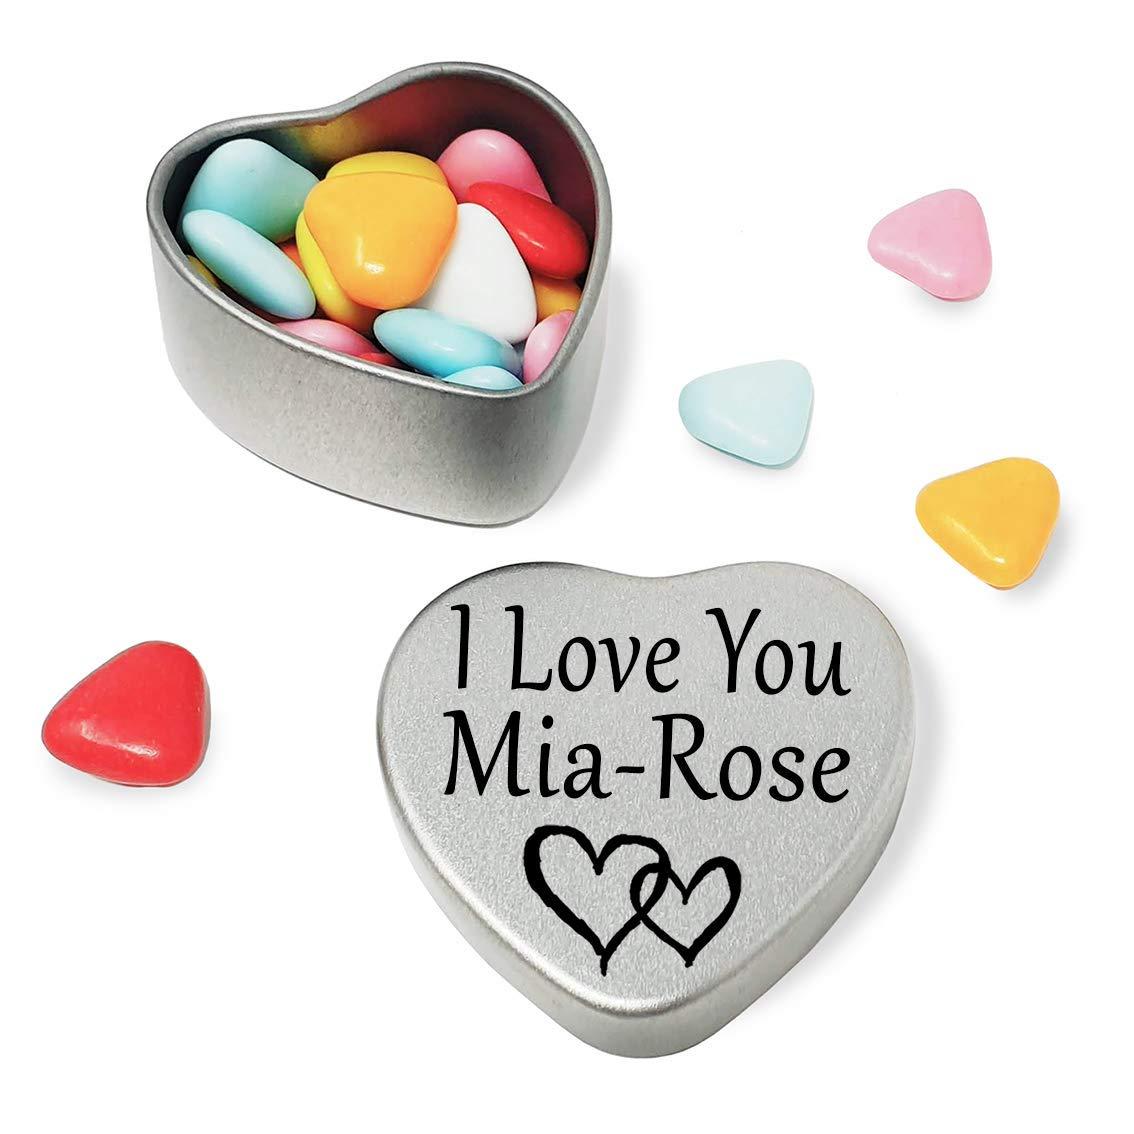 Happy Birthday Mia Mini Heart Tin Gift Present For Mia WIth Chocolates